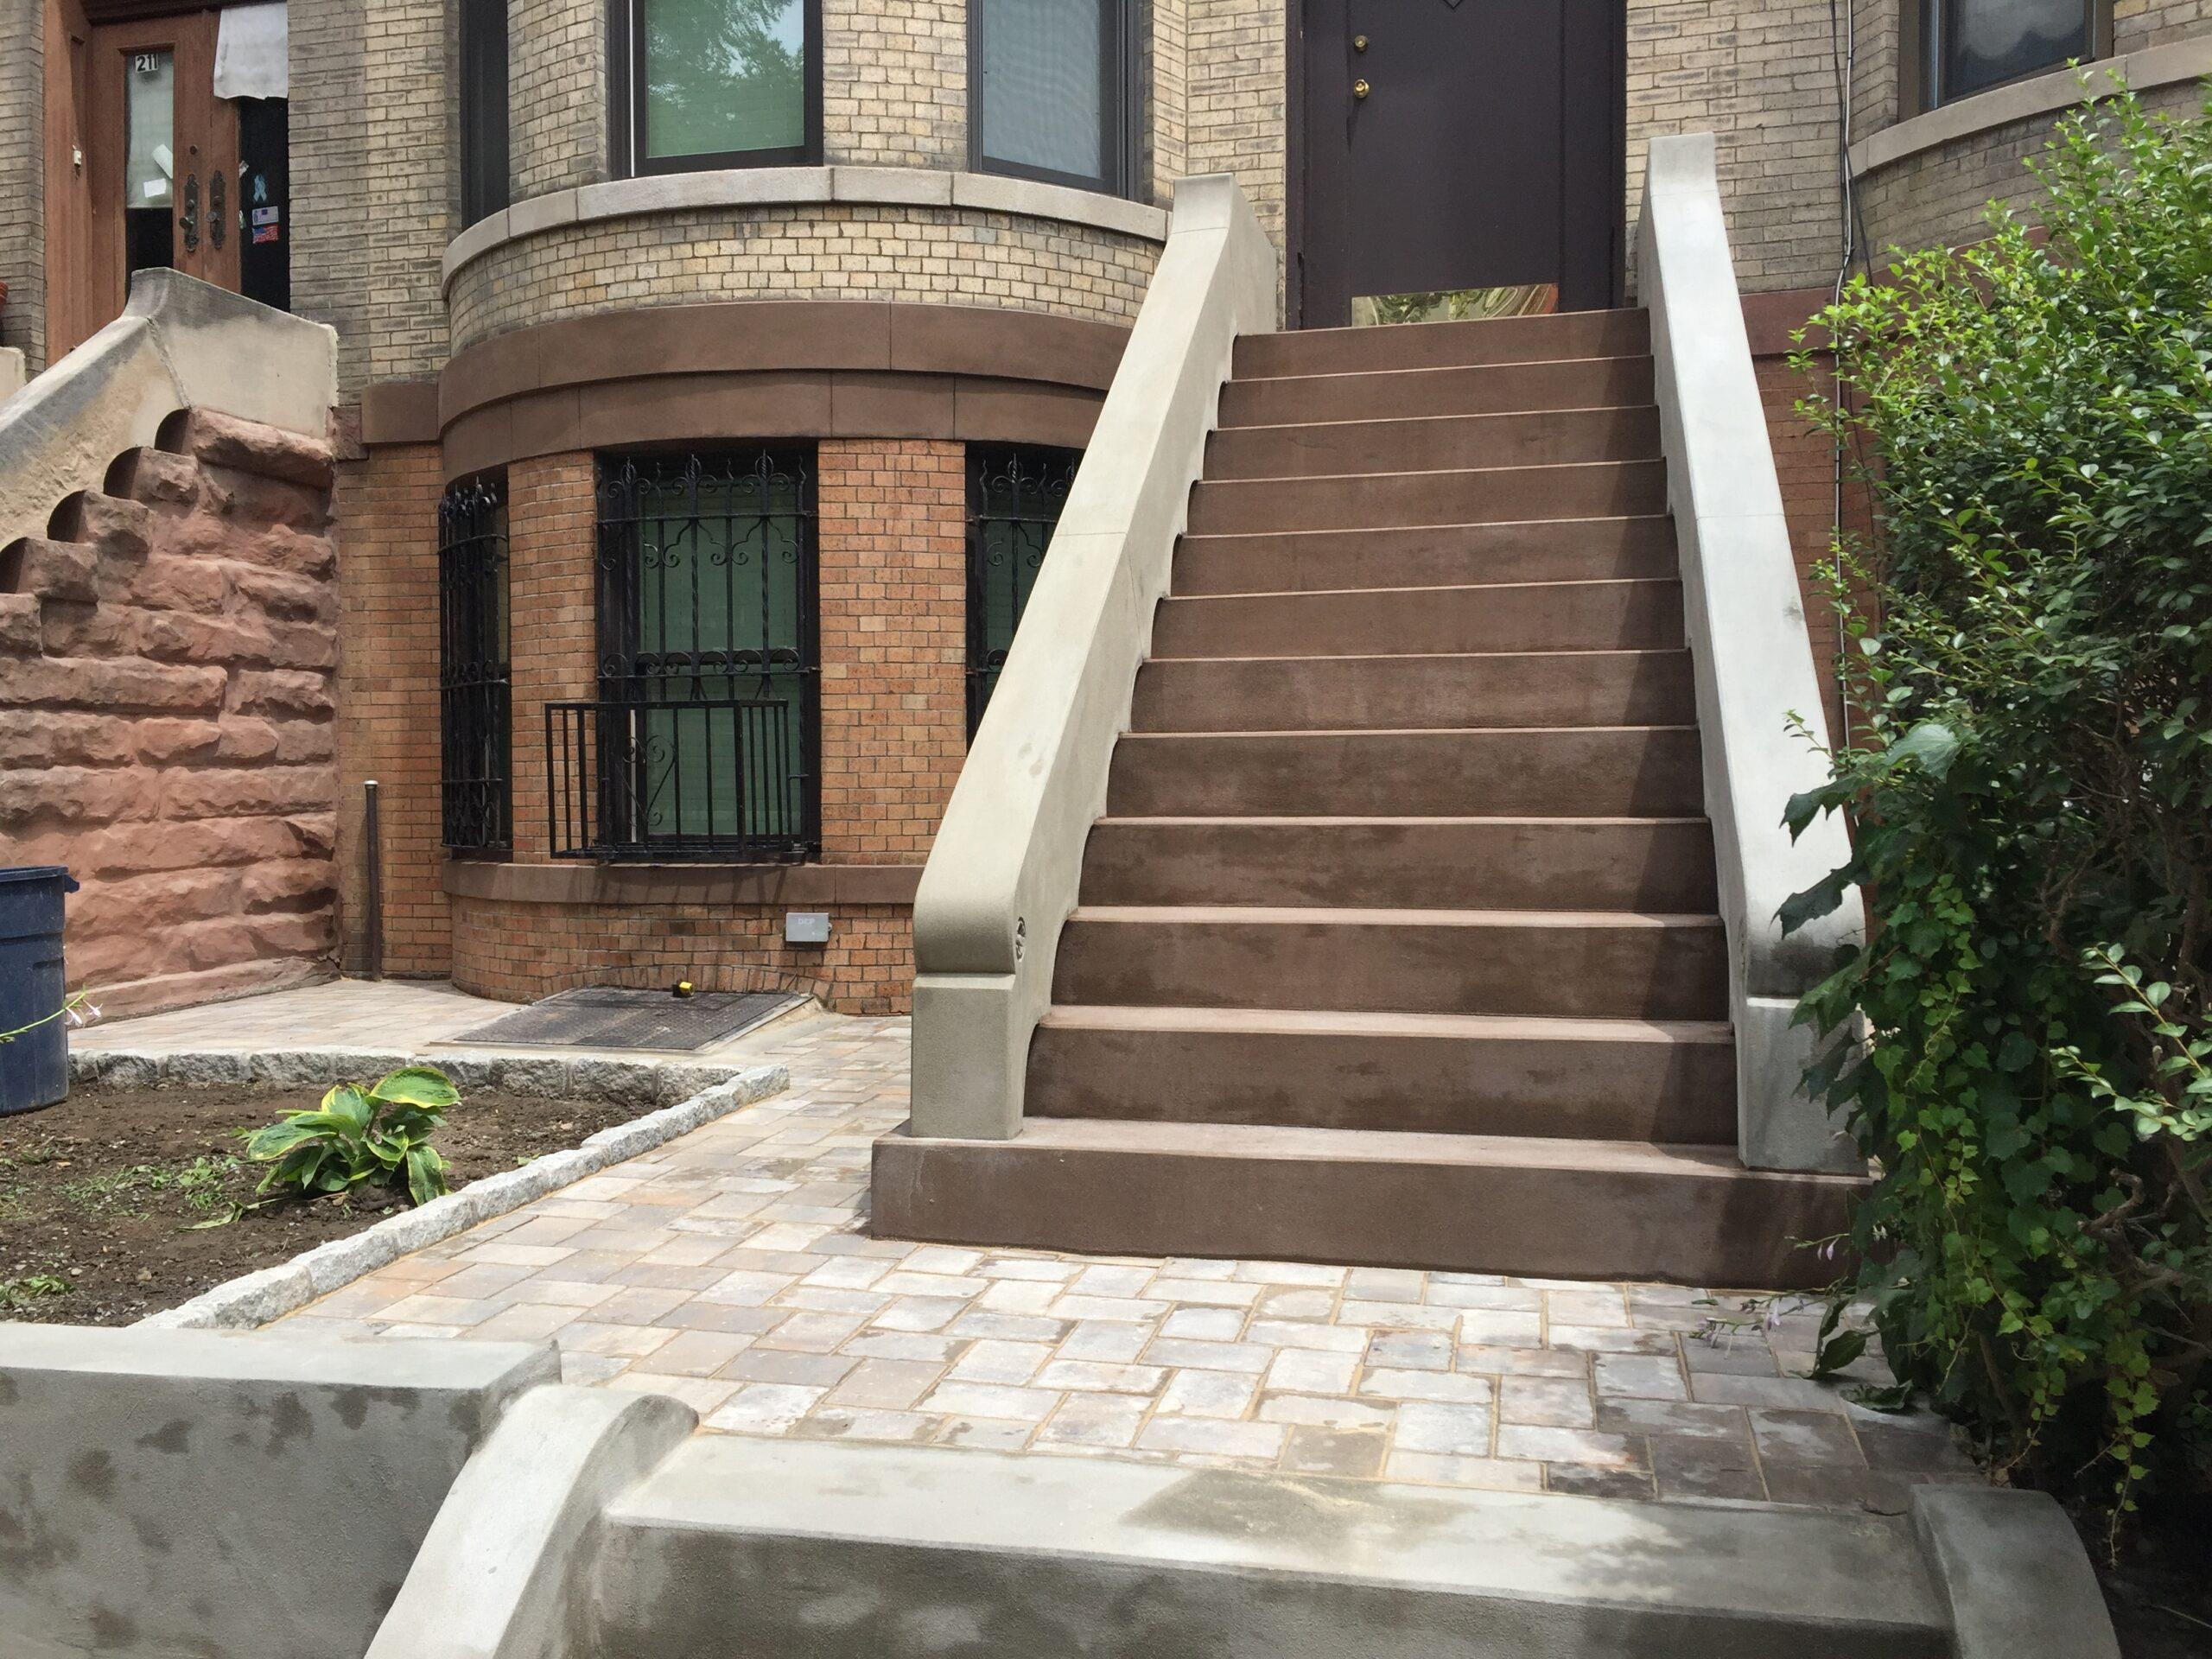 213 East 8th St- Kensington Brooklyn- Brownstone Step